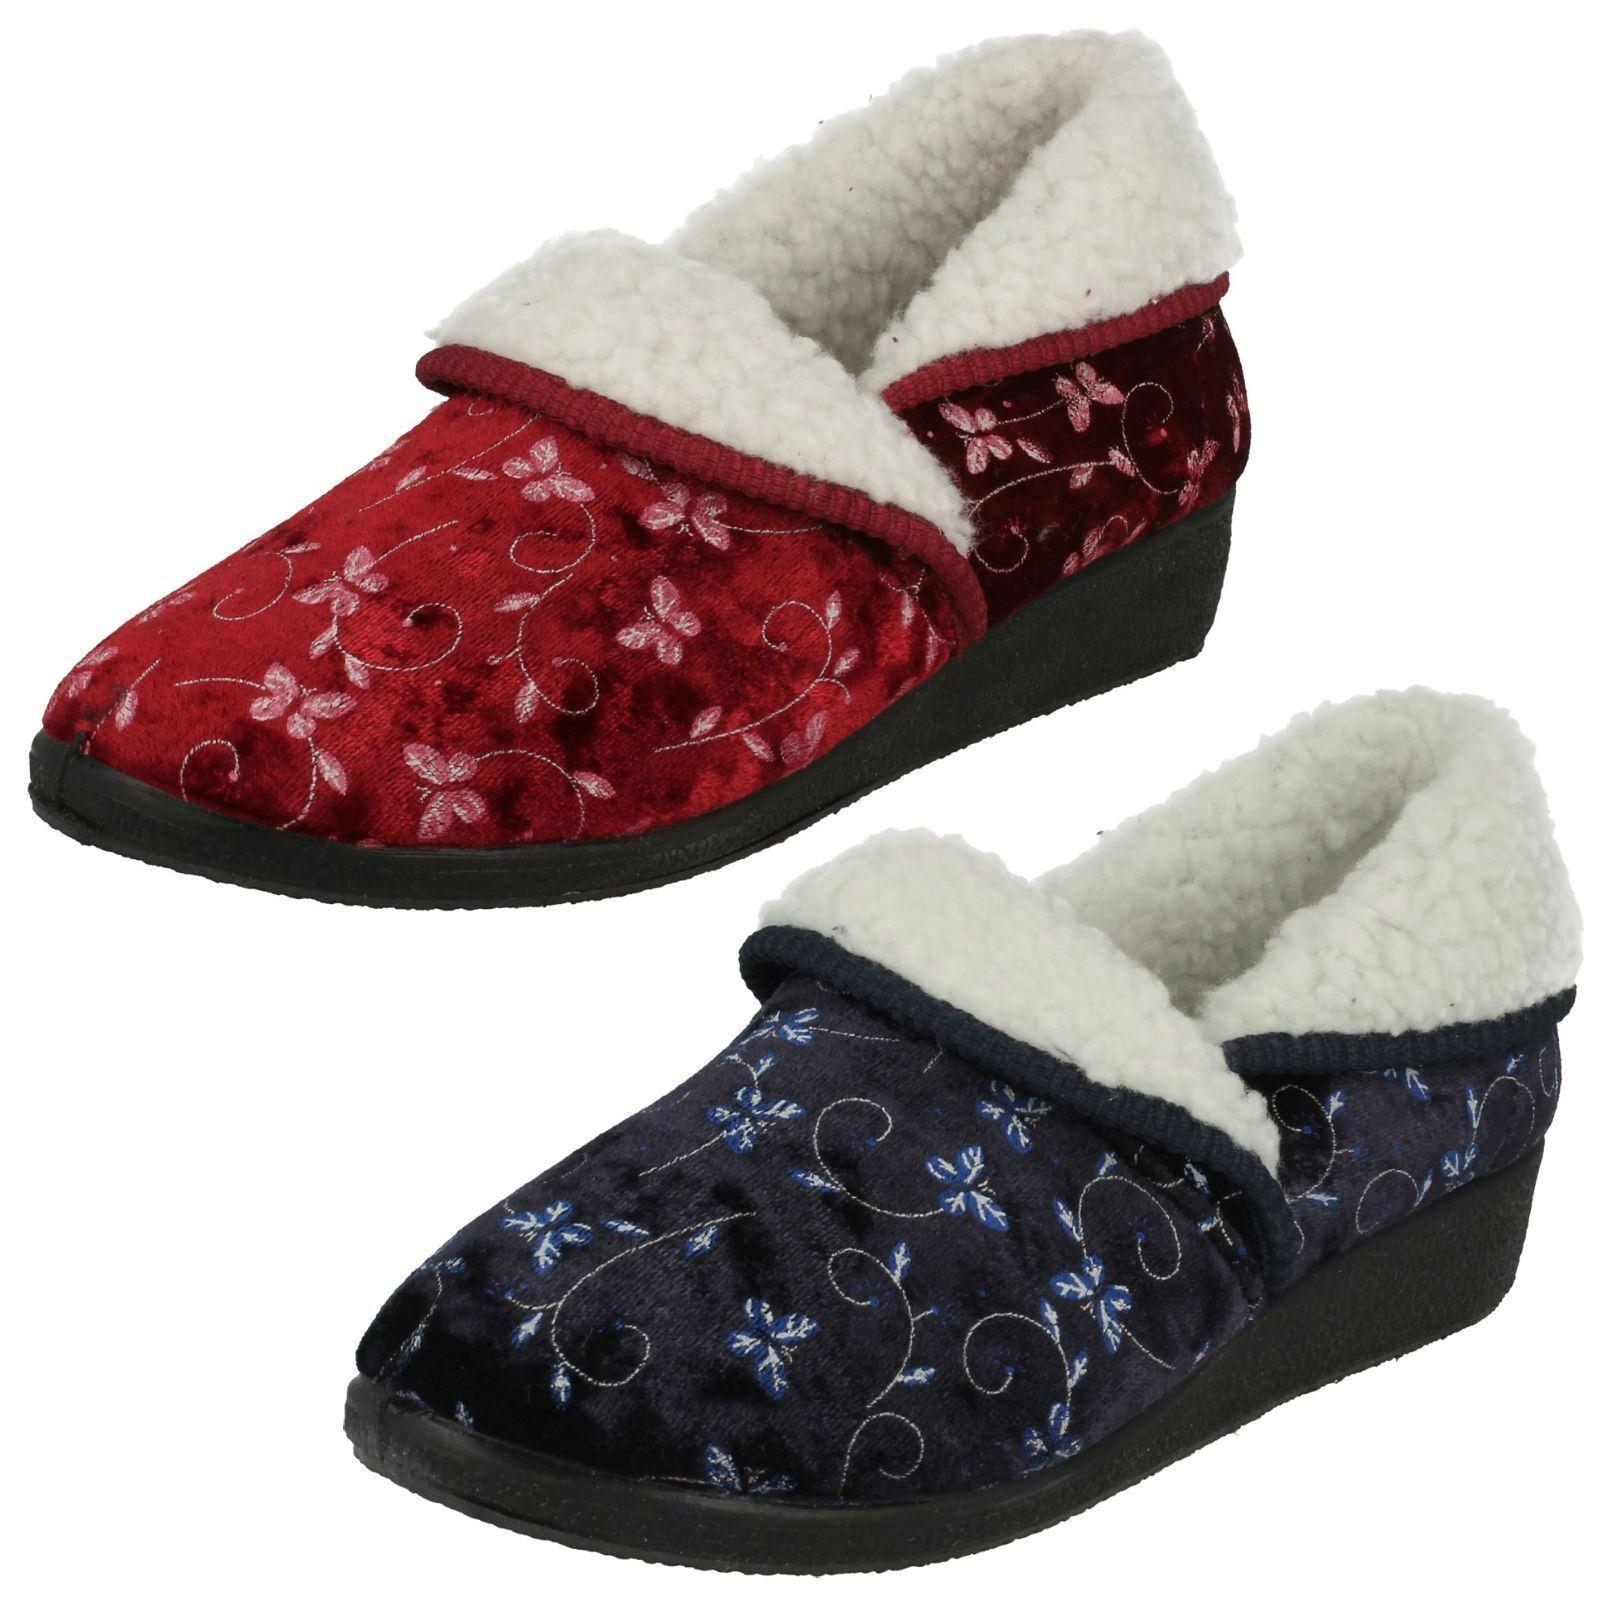 Ladies four seasons navy and burgundy slippers EDITH